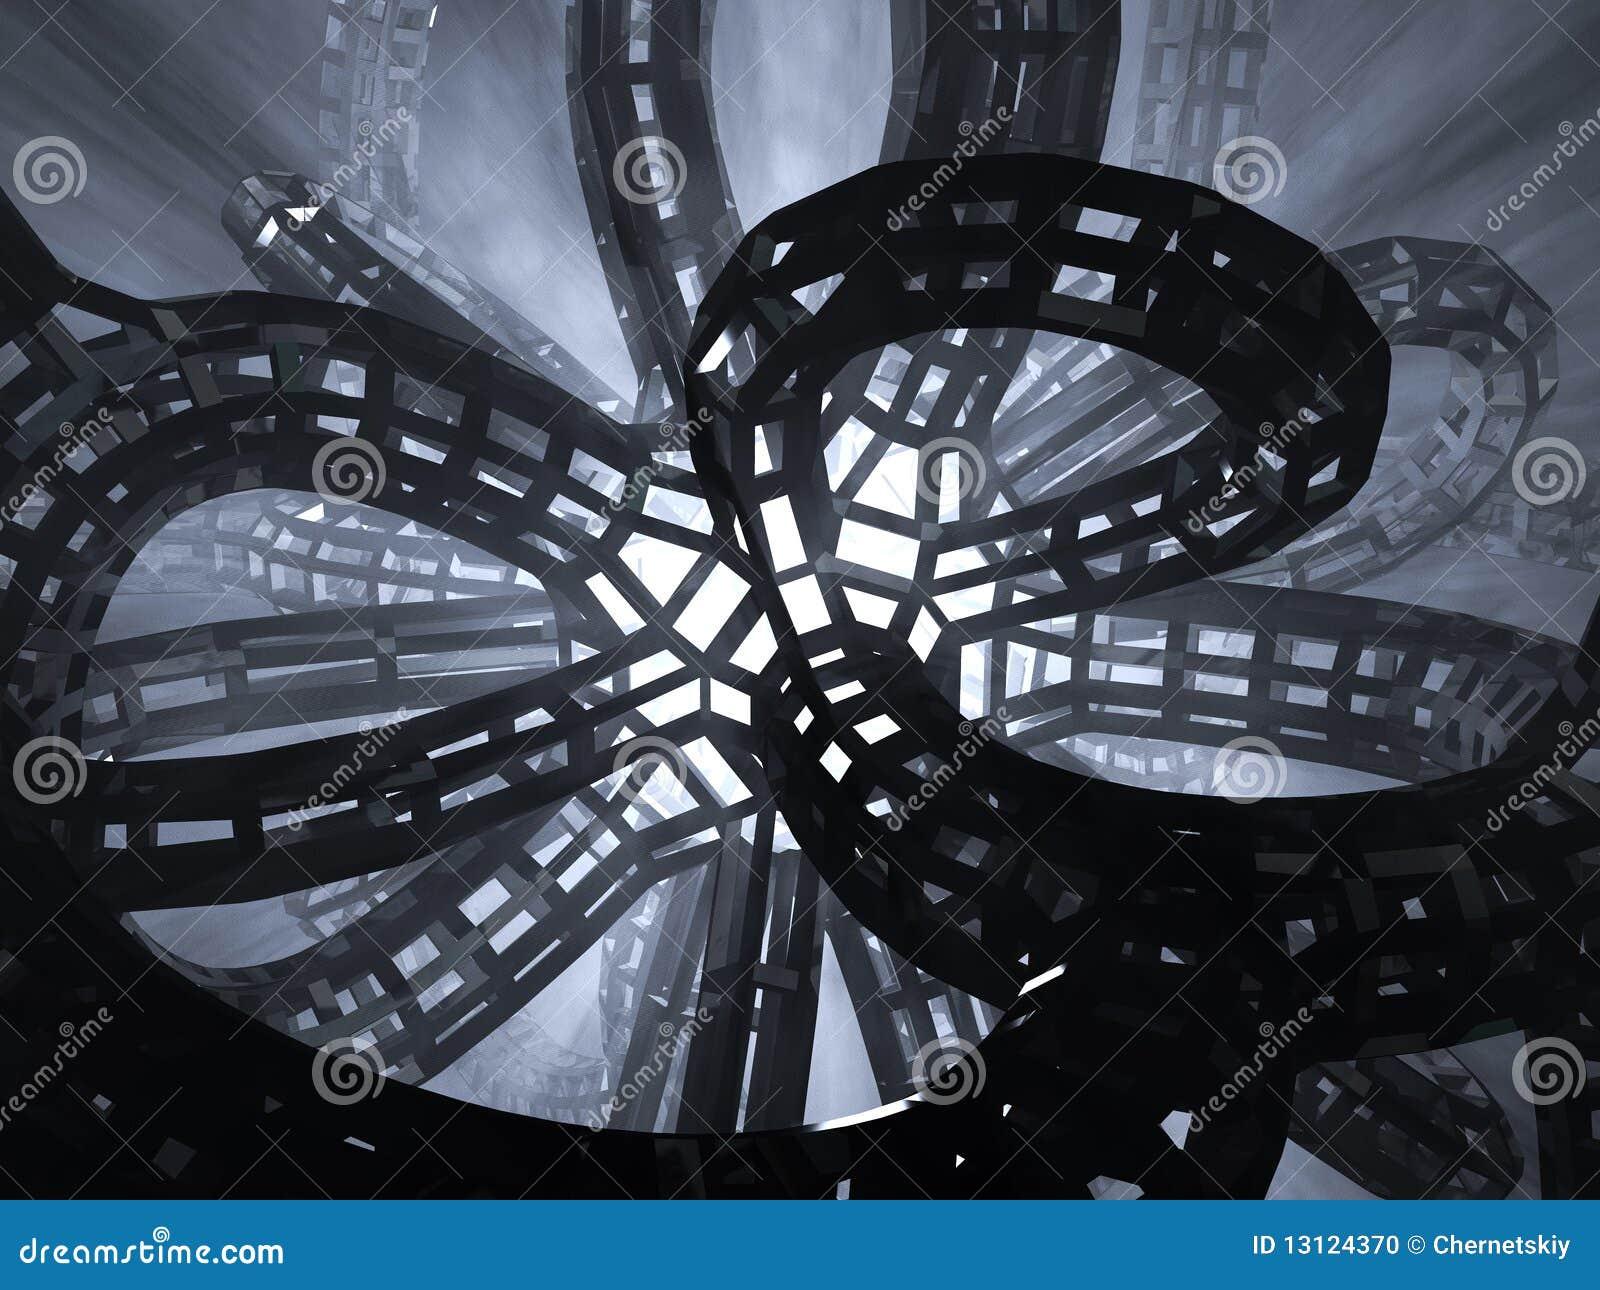 Futuristic Architecture Royalty Free Stock Image - Image: 8901116